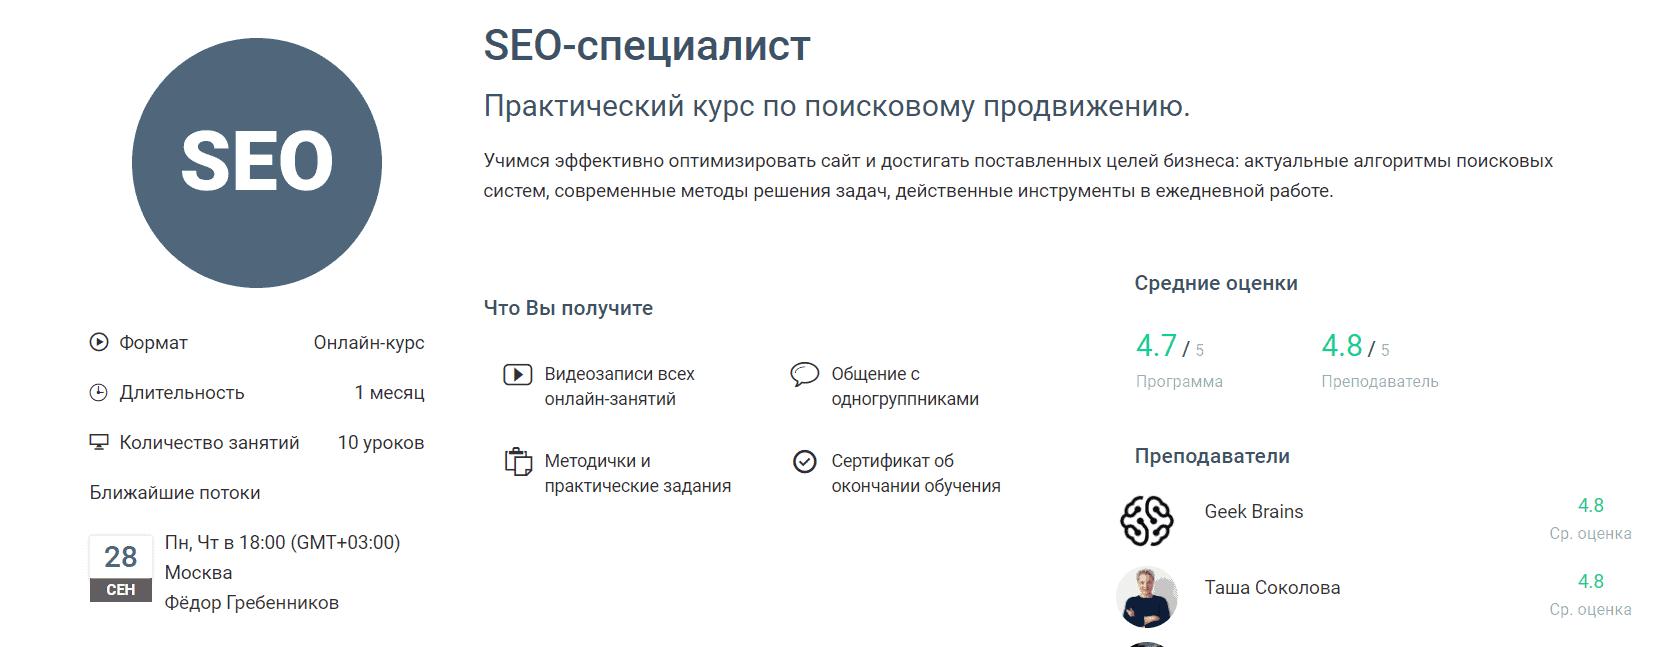 SEO — практический курс от GeekBrains